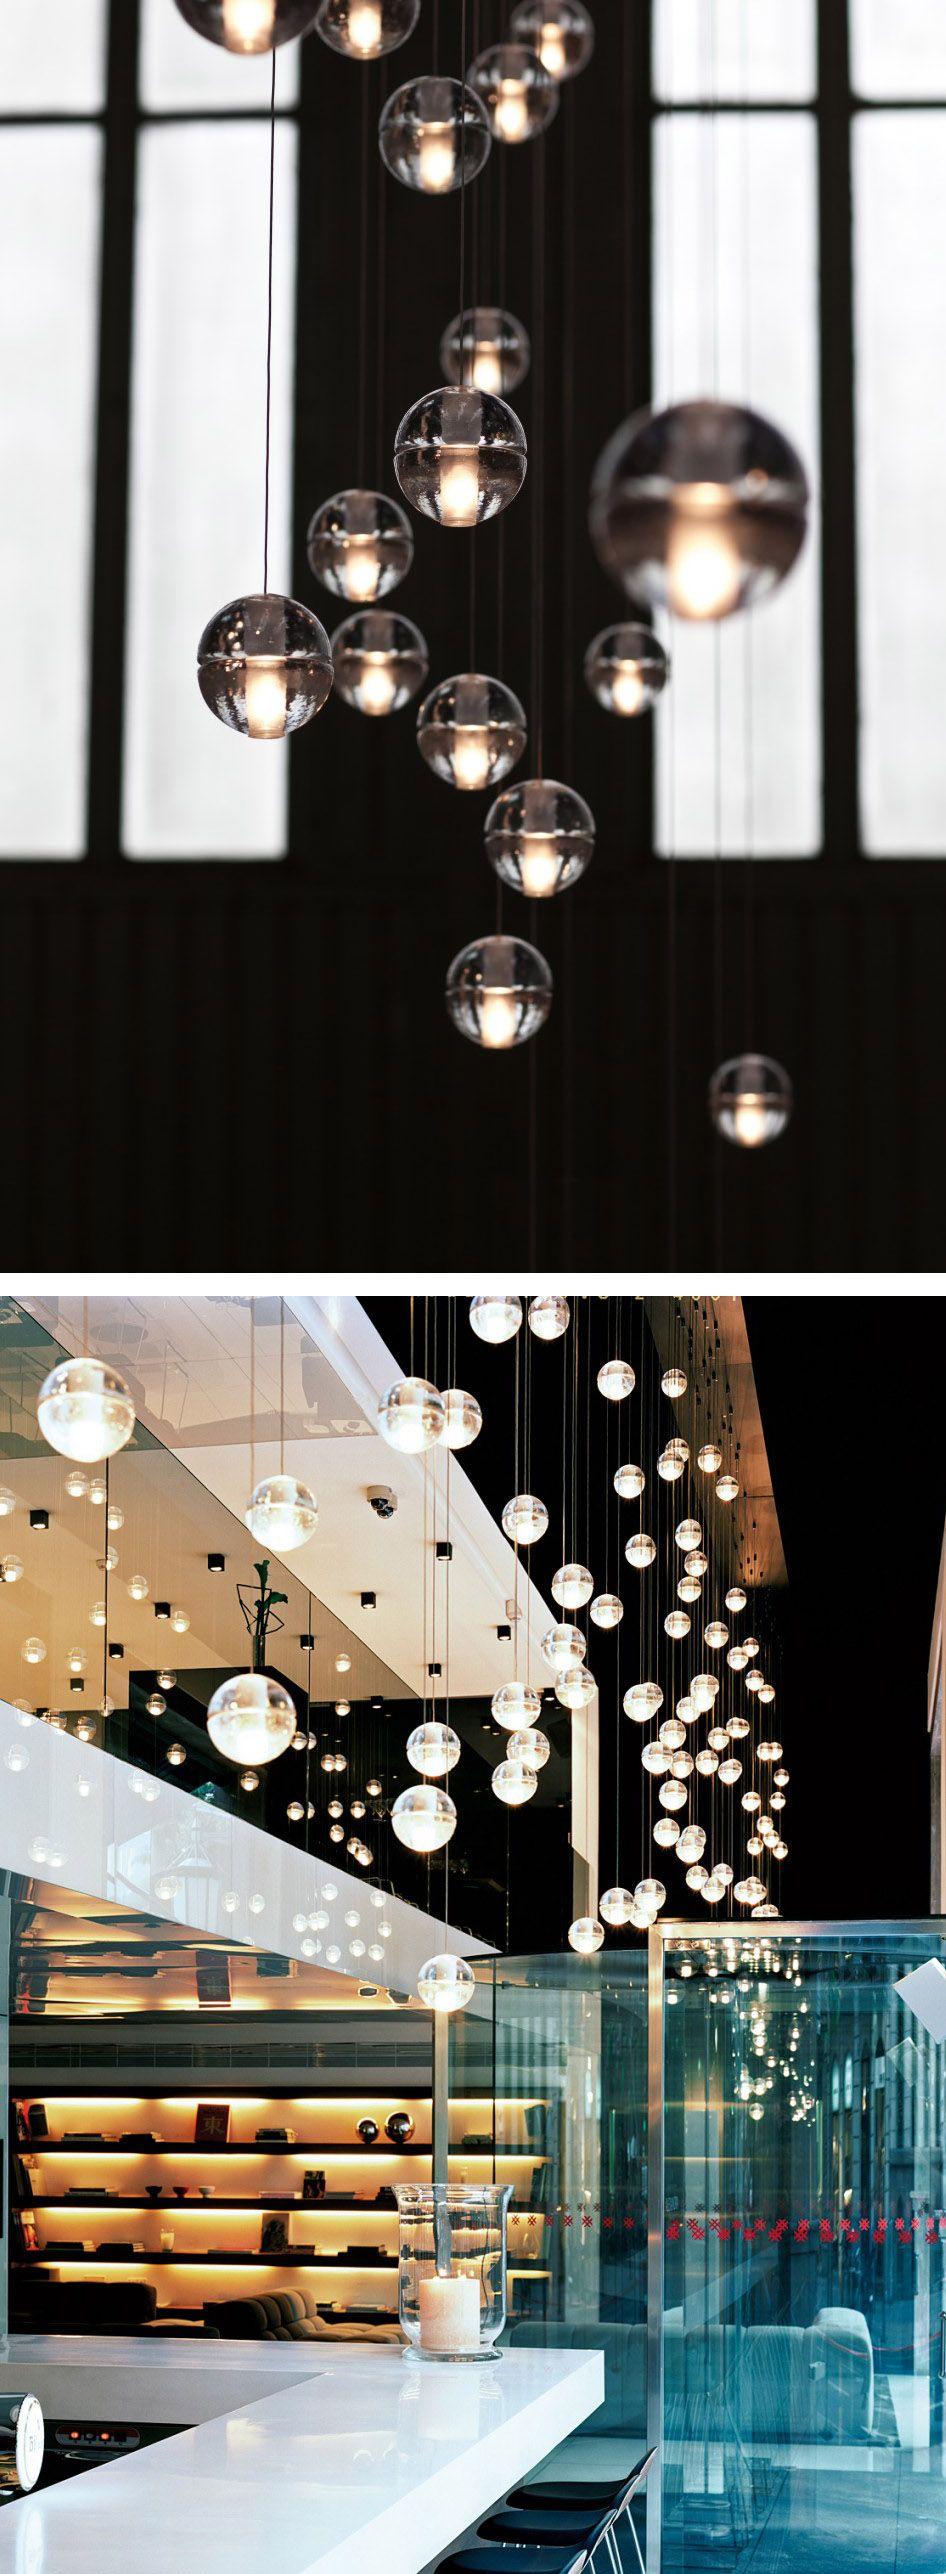 Bocci series 14 pendant lights Might be